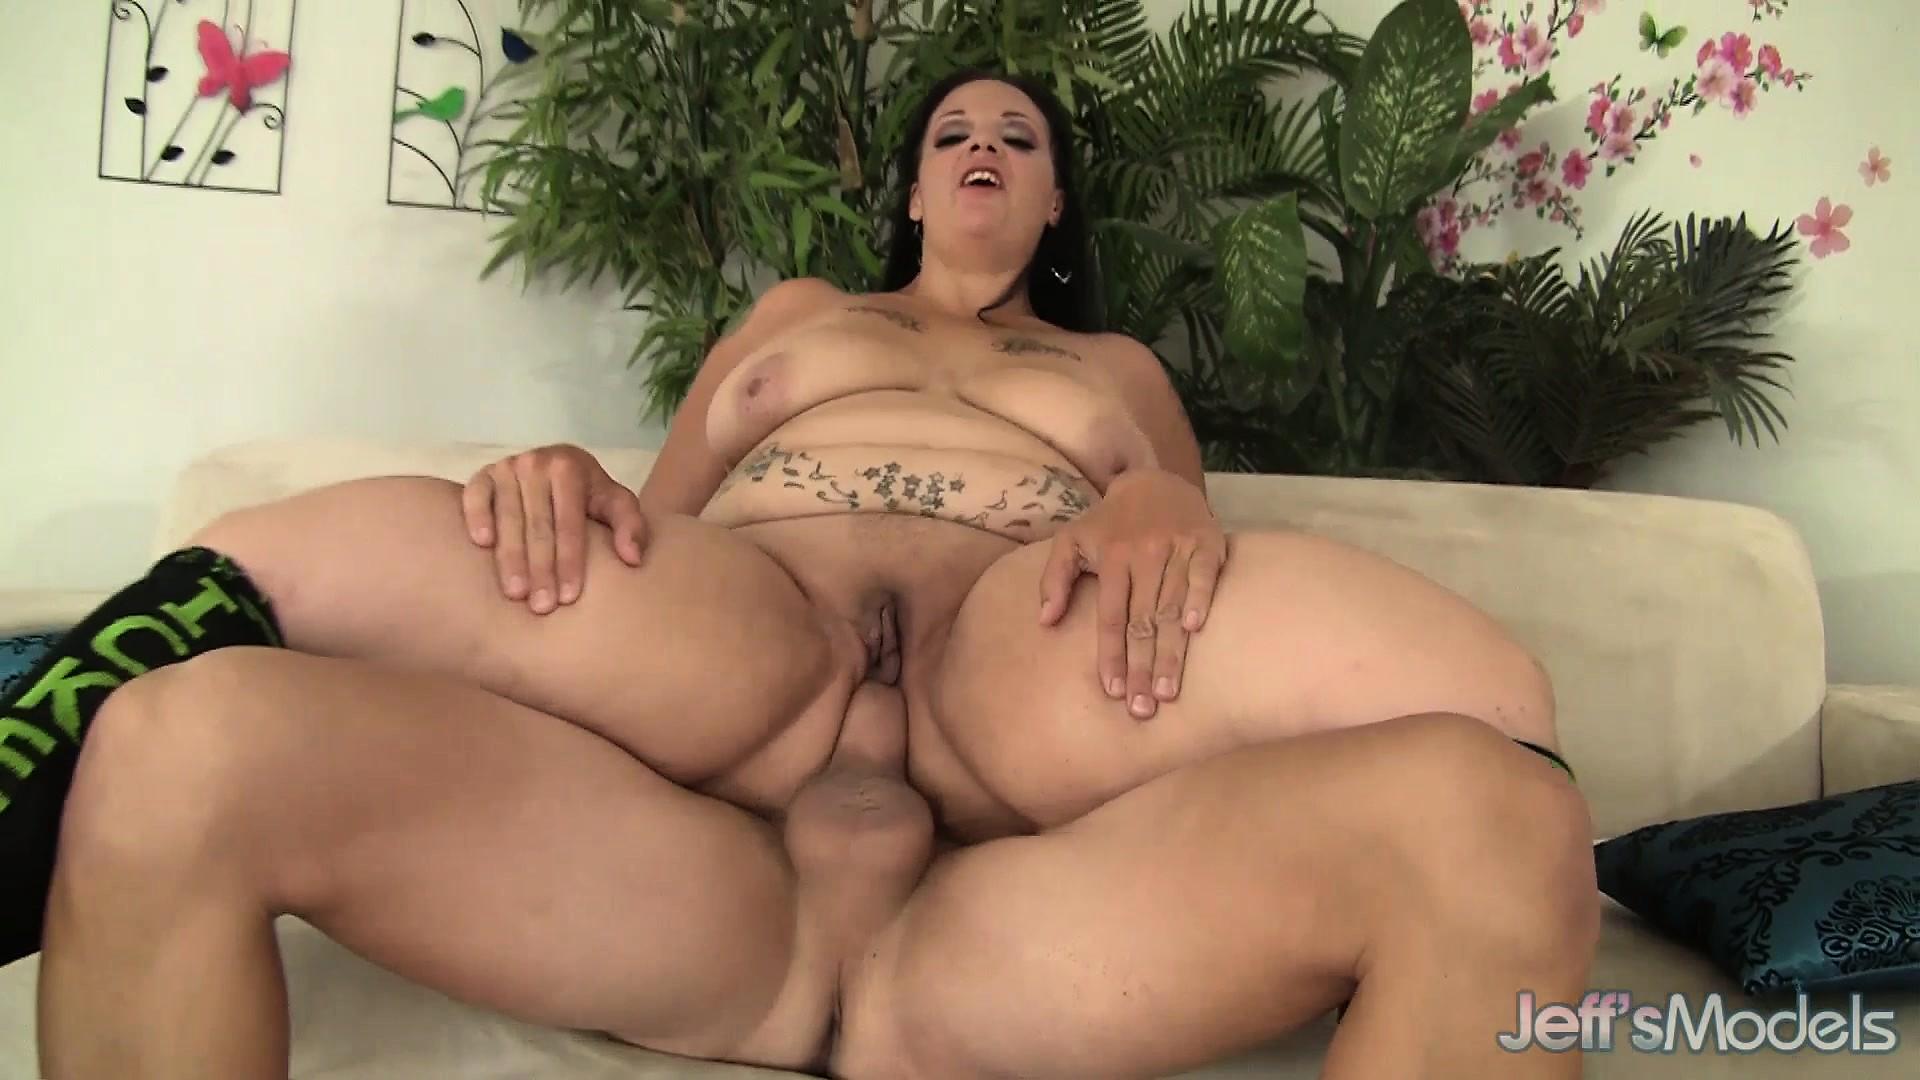 Порно толстушки фото hd 33471 фотография